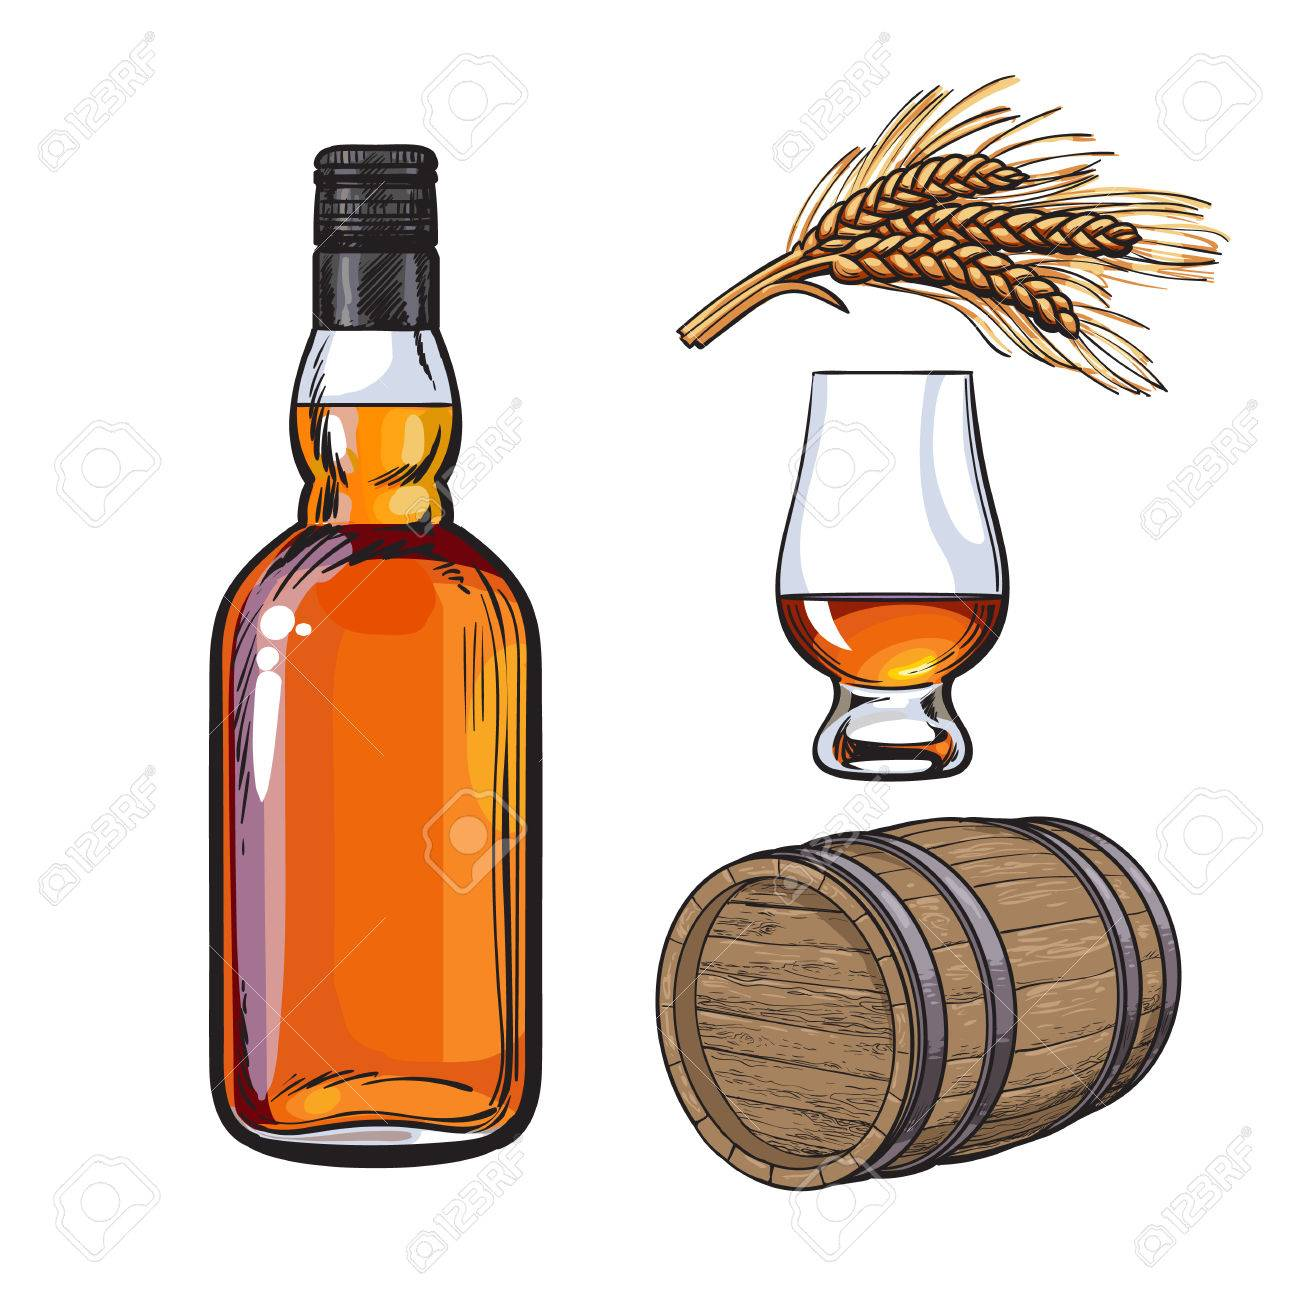 1300x1300 Set Of Hand Drawn Whiskey Bottle, Glass, Barrel And Malt, Sketch